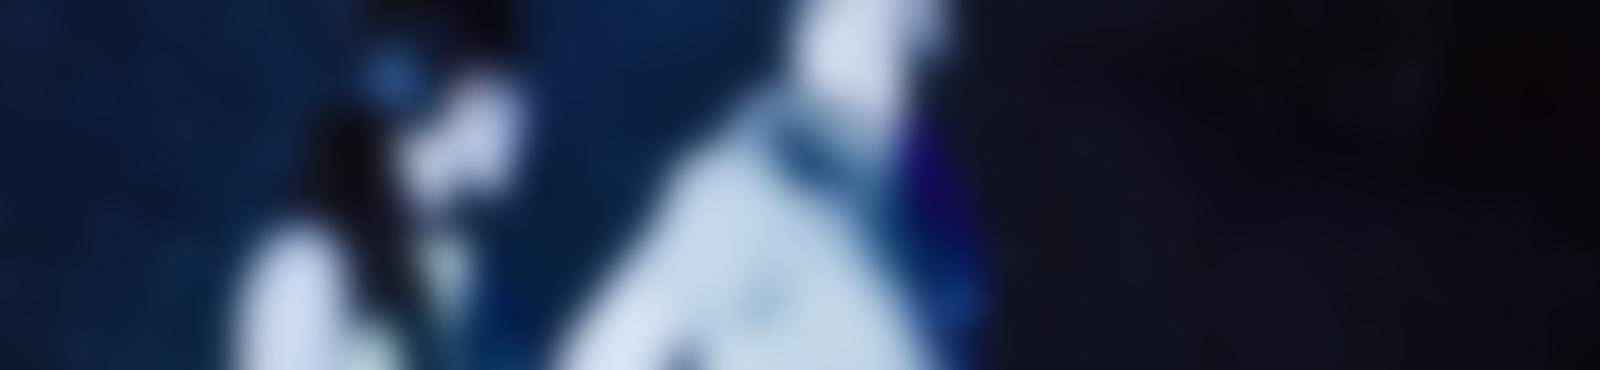 Blurred bd43f047 cb27 4779 bcbc 3b08e26057c4